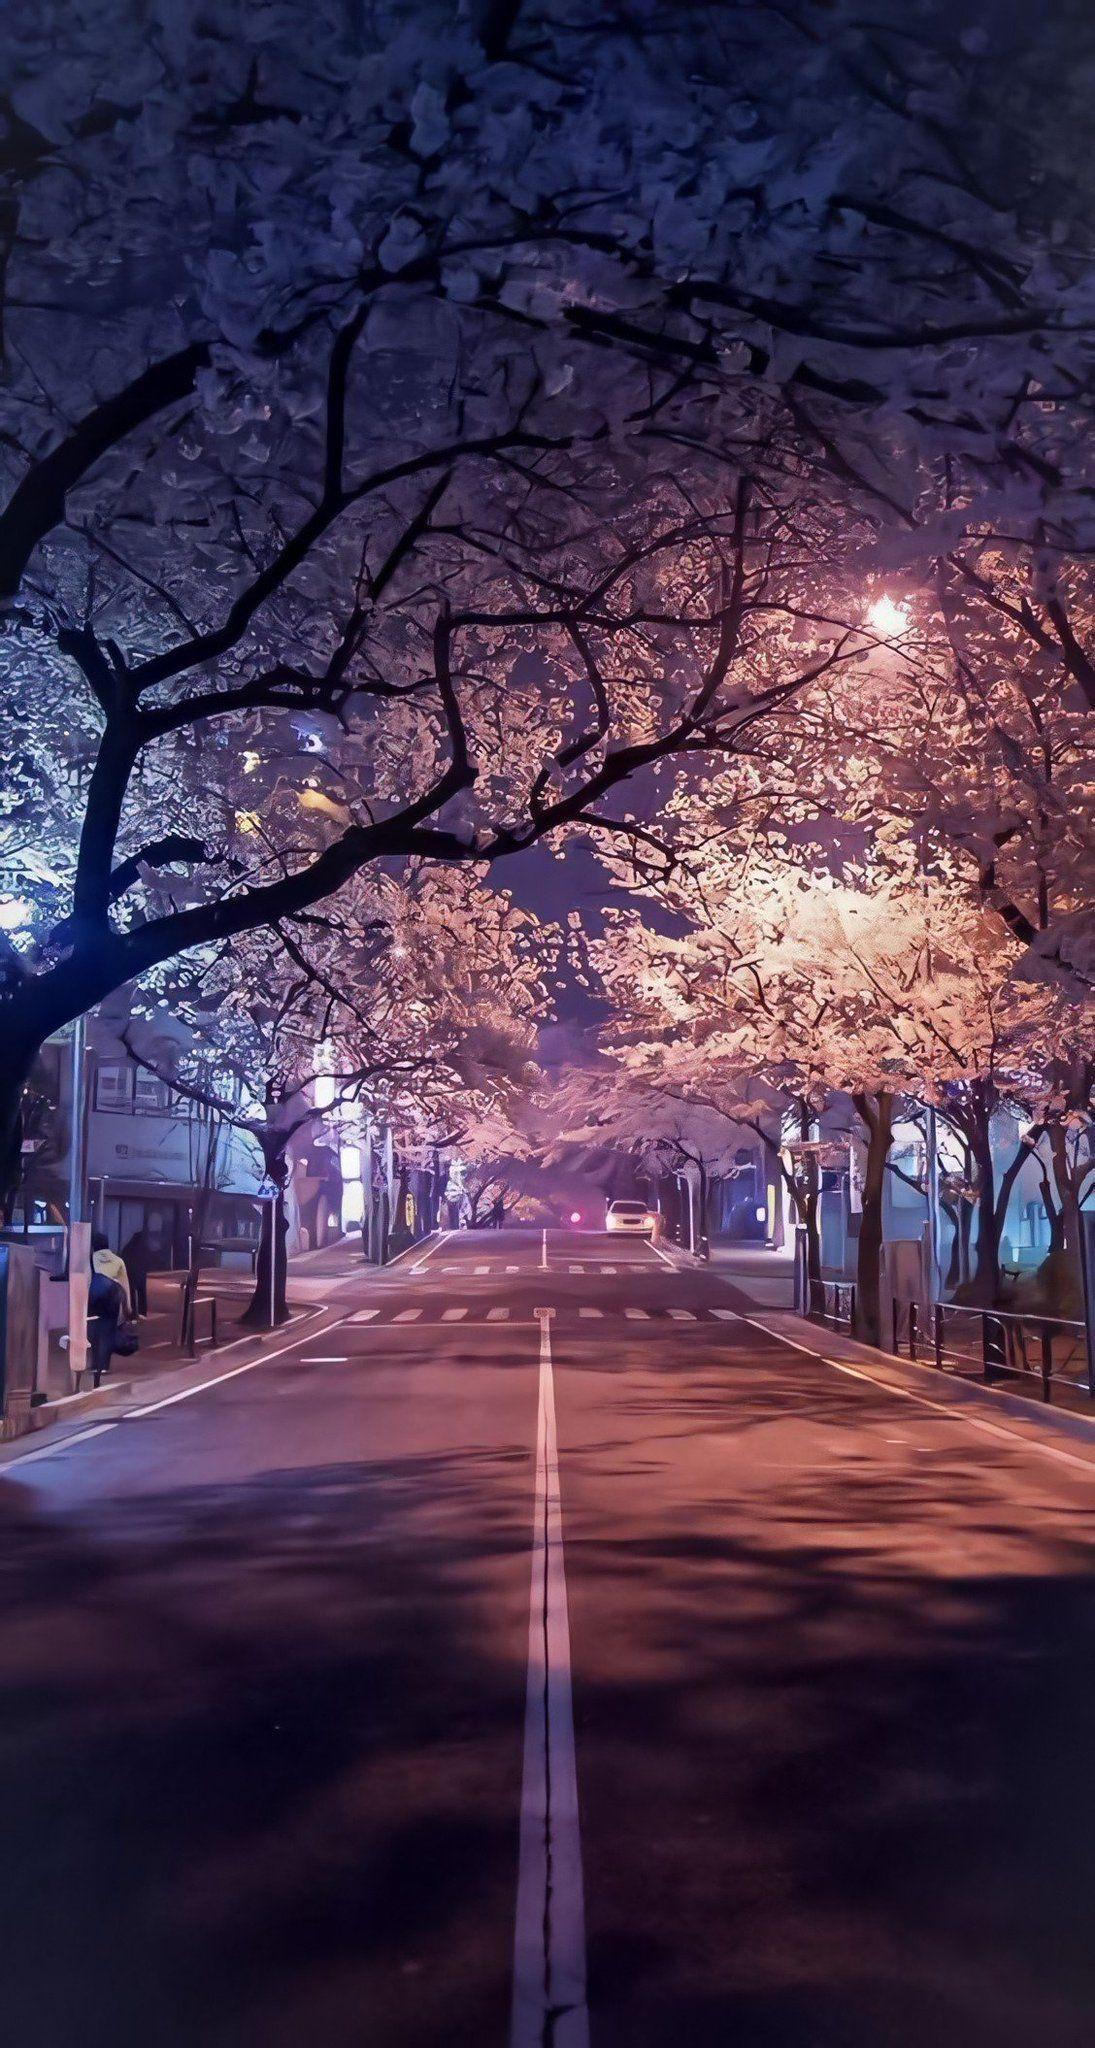 Japan Visuals On Twitter In 2021 Cherry Blossom Wallpaper Cherry Blossom Background Japan Aesthetic